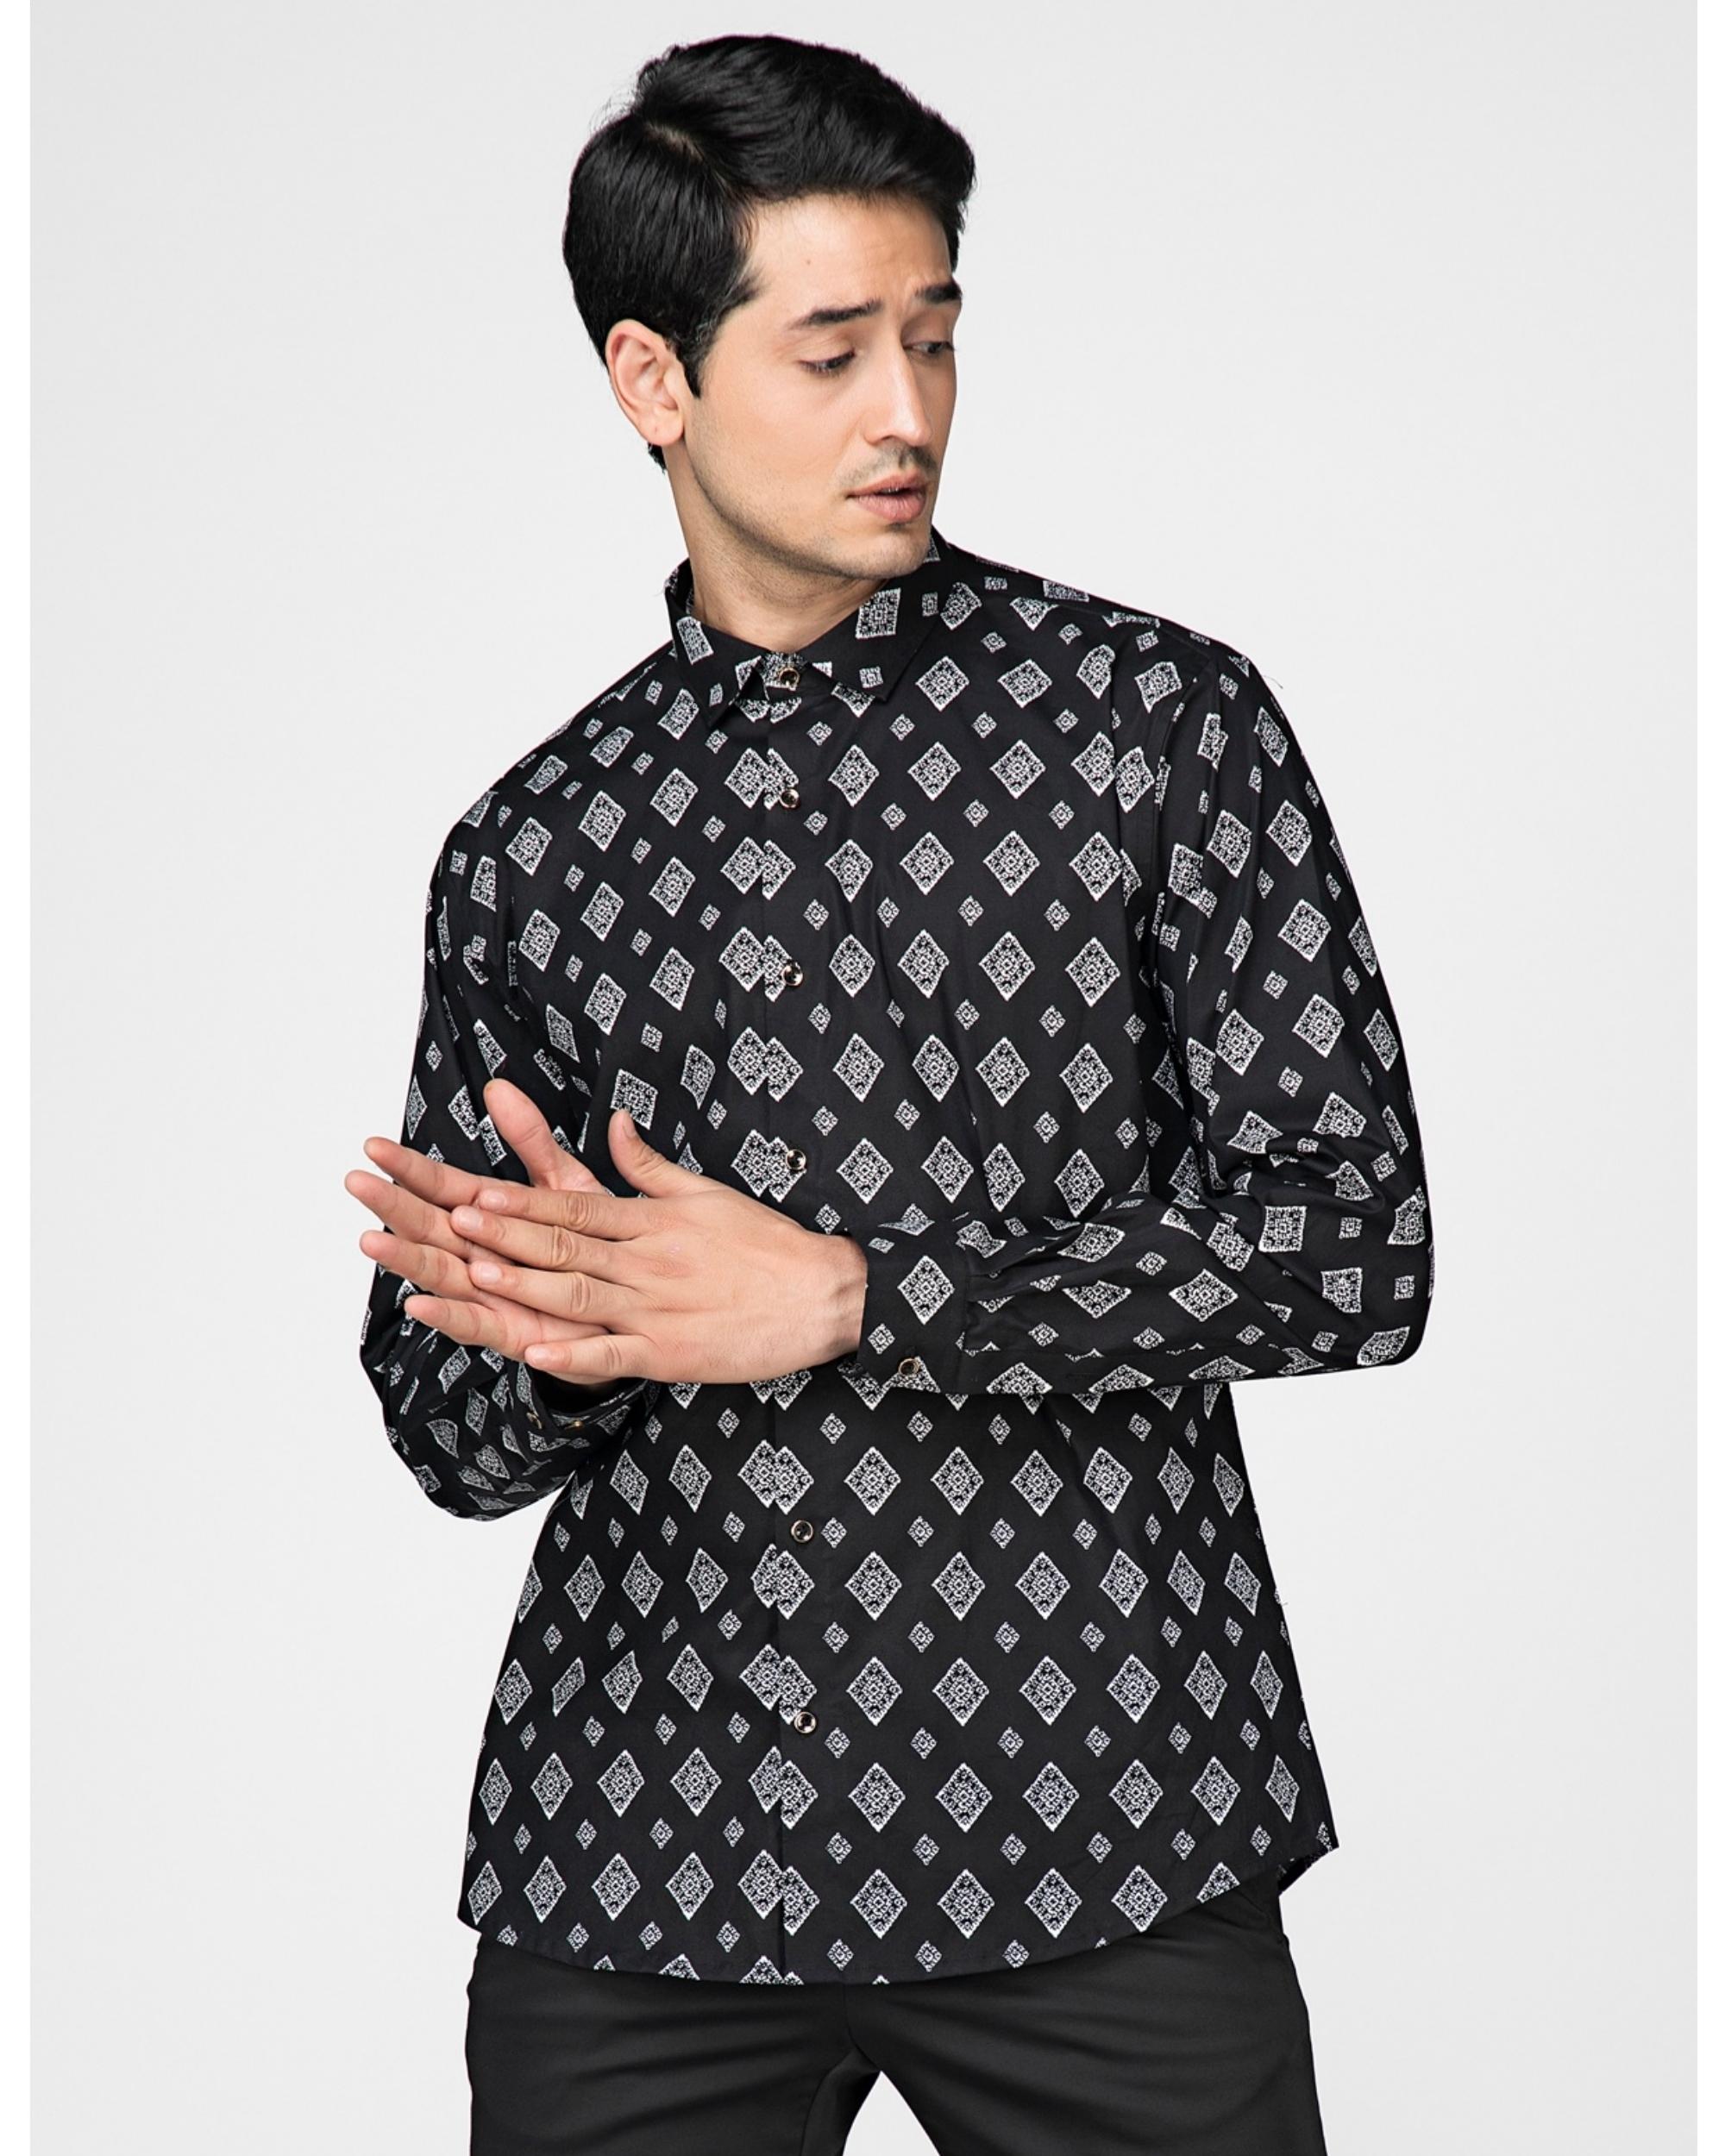 Black and white diamond printed shirt